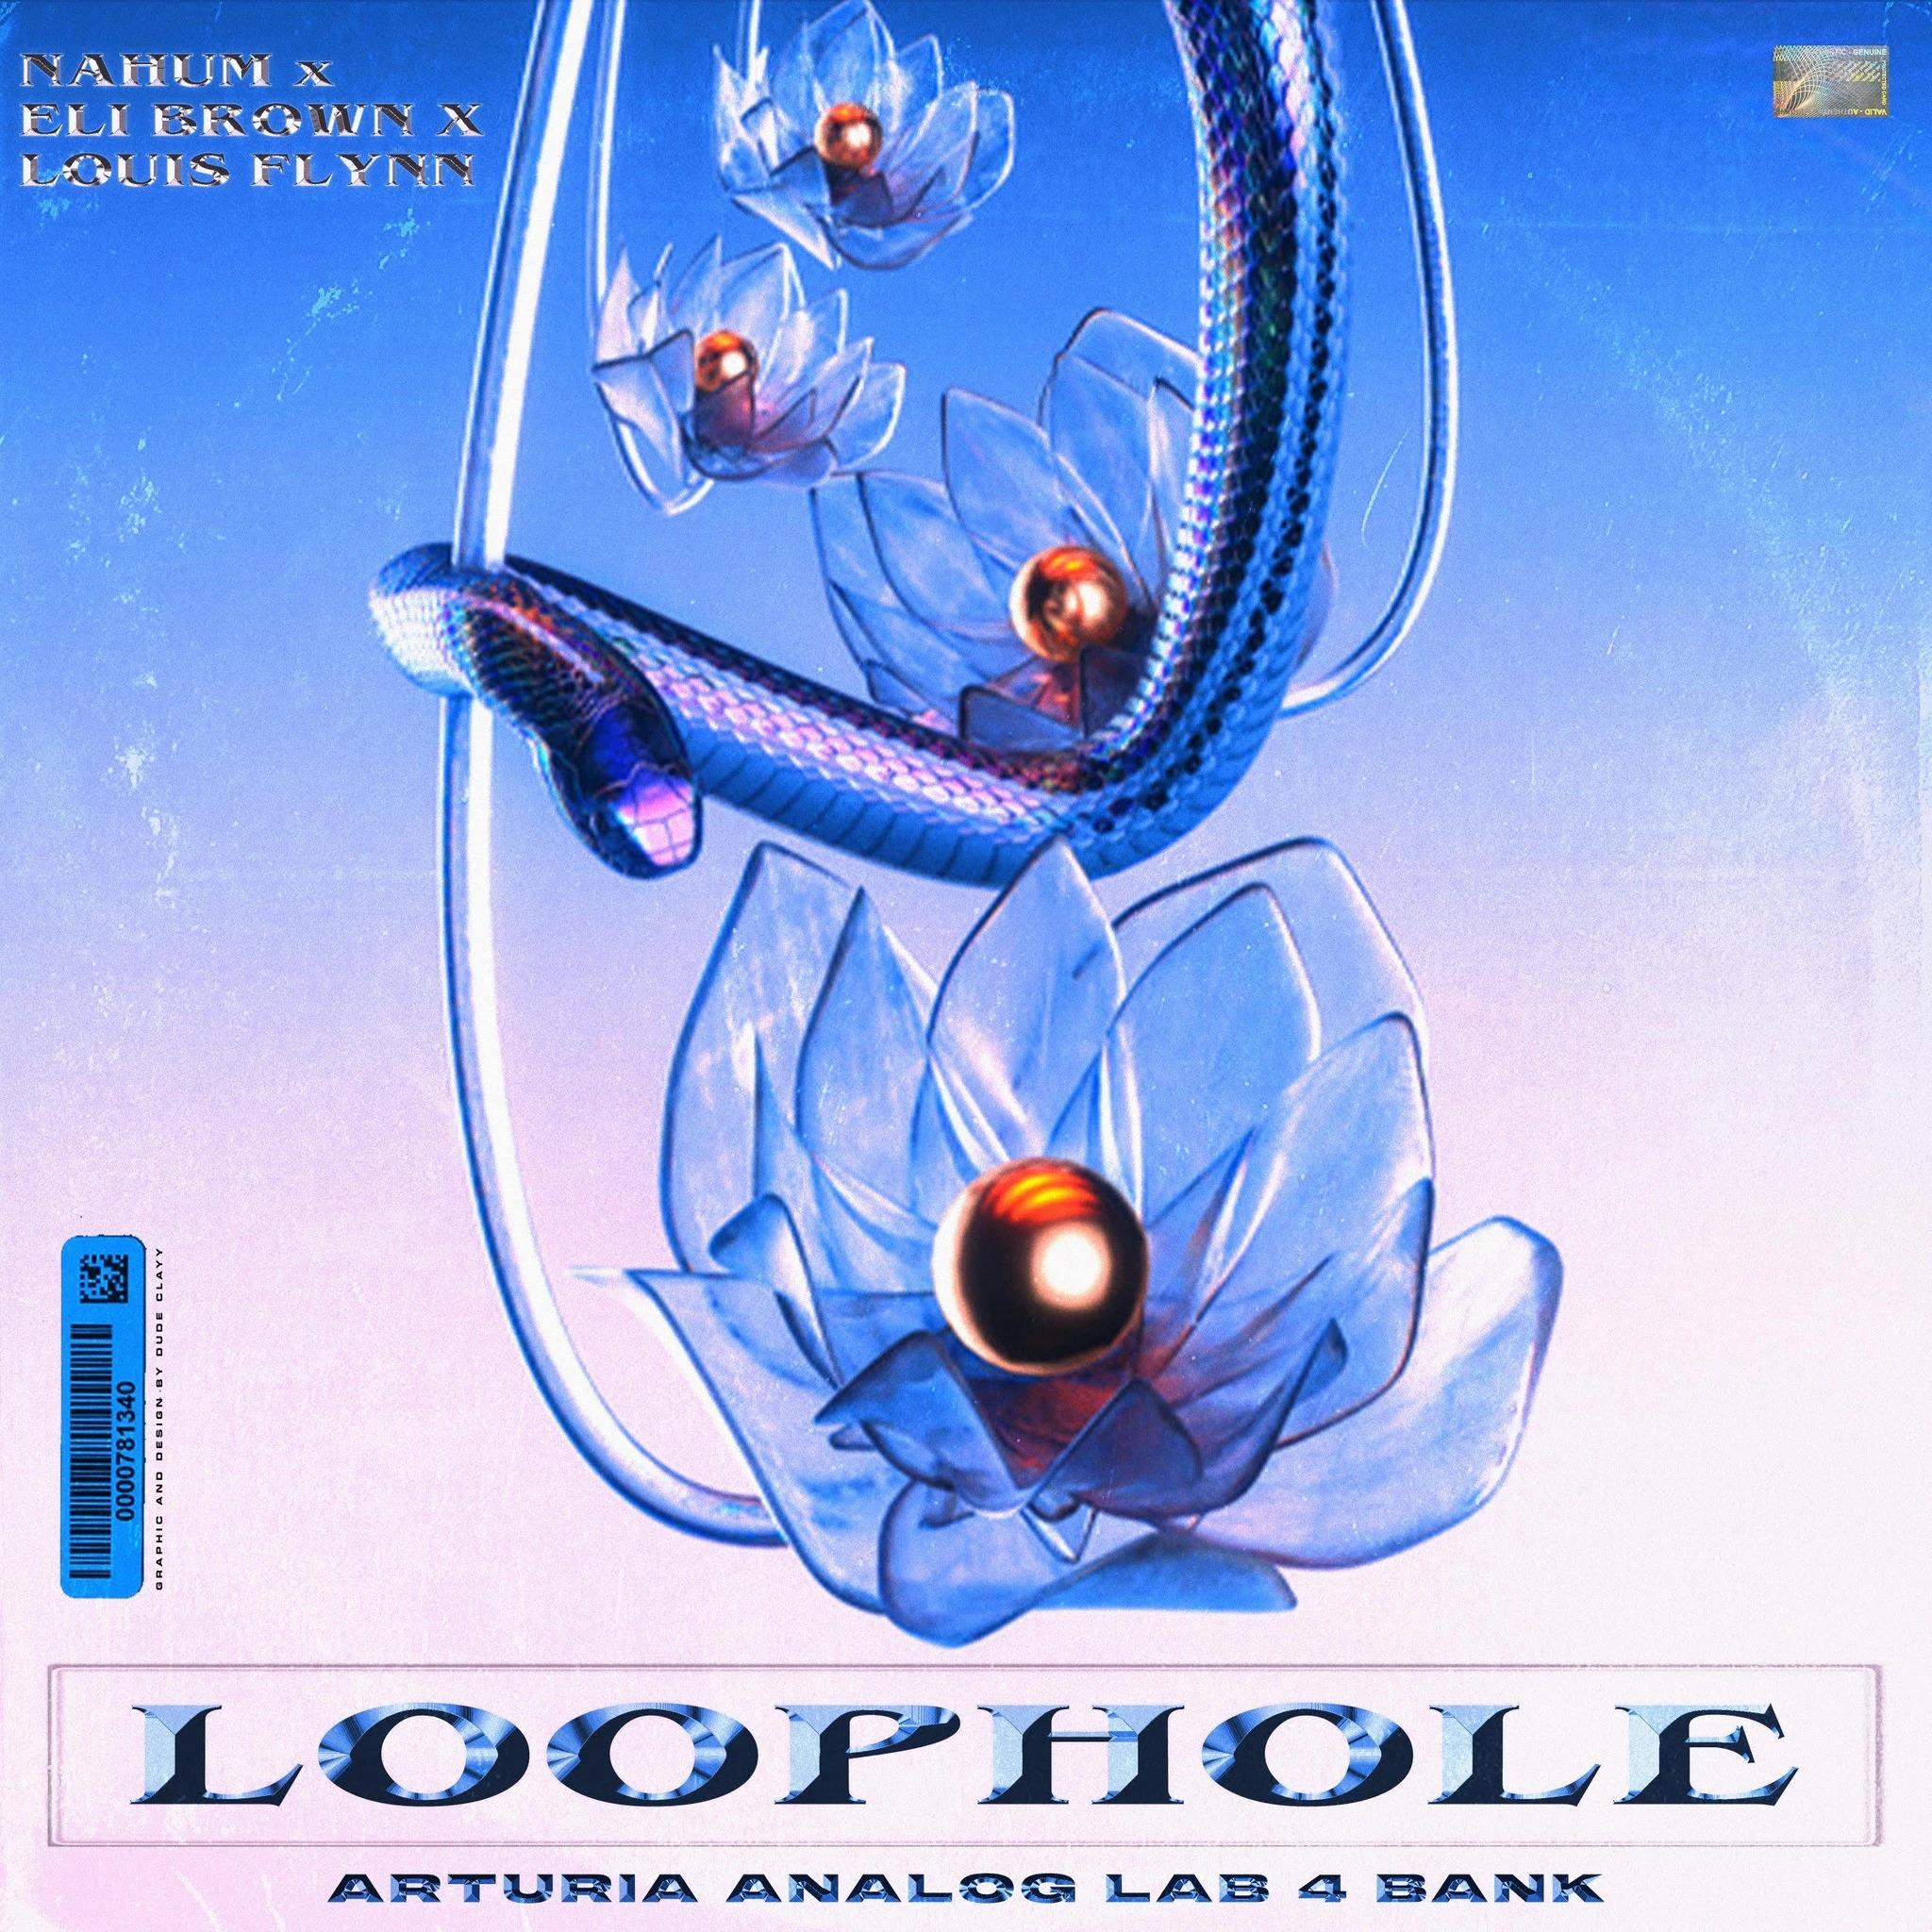 Up North Music Group – LOOPHOLE – ARTURIA ANALOG LABS 4